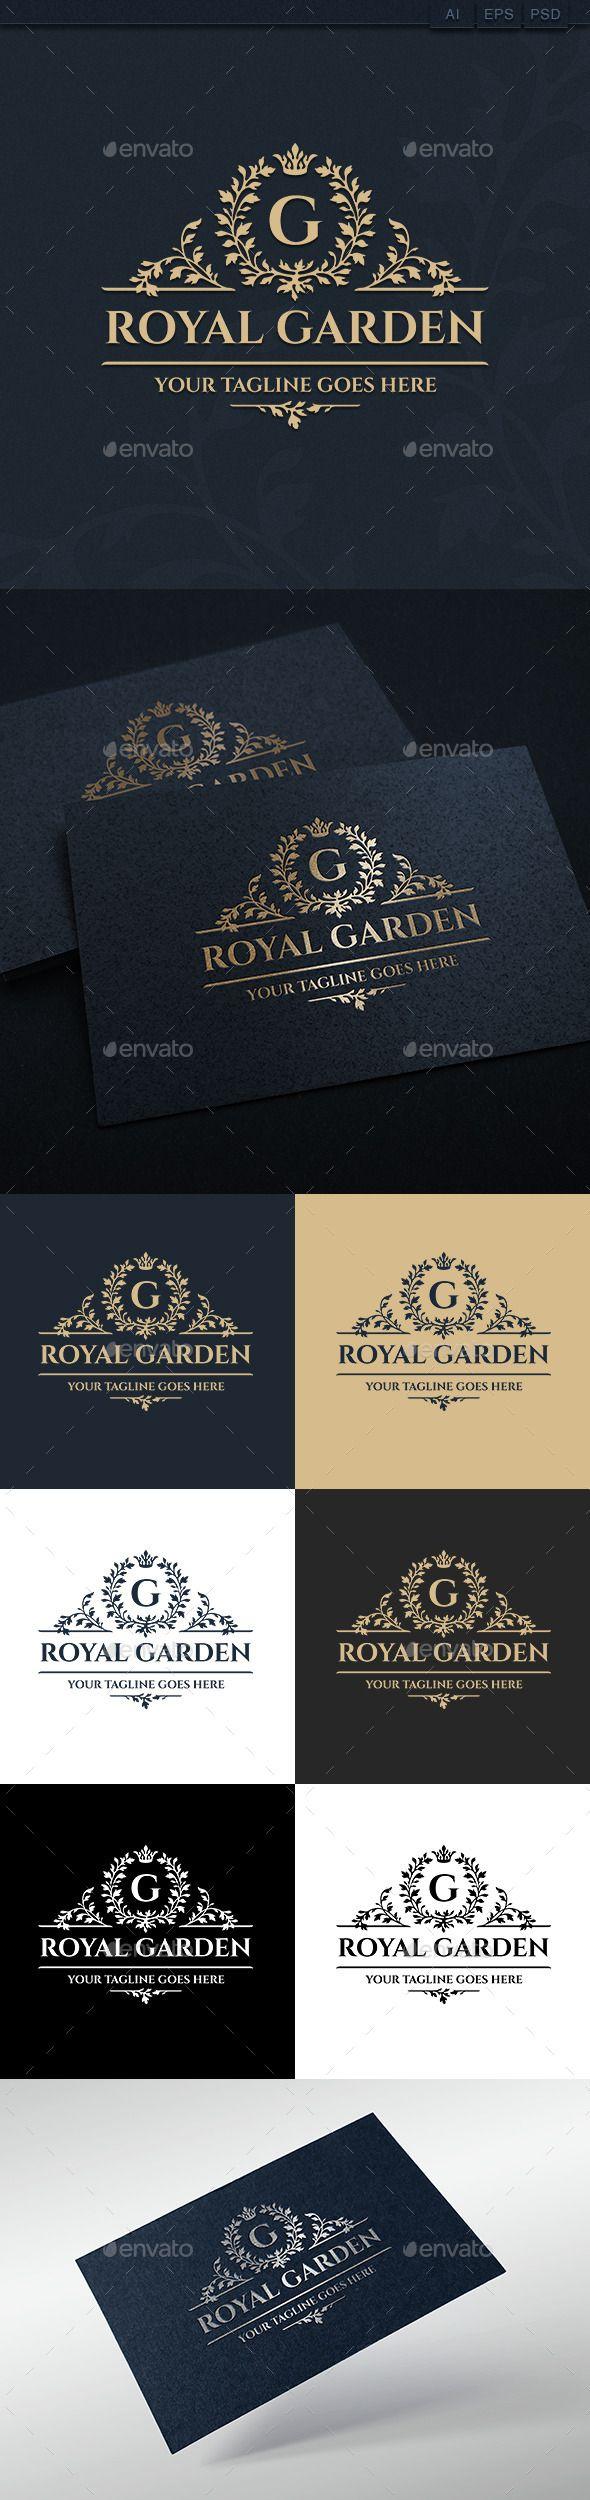 Royal Garden (Vector EPS, AI Illustrator, Resizable, CS, arts, cafe, club, company, creative, crown, decorative, elegant, emblem, fashion, florist, flower shop, foliage, garden, herb, hotel, jewellery, letter, luxurious logo, luxury, majestic, mark, ornament, real estate, restaurant, royal logo, royalty, shop, team)